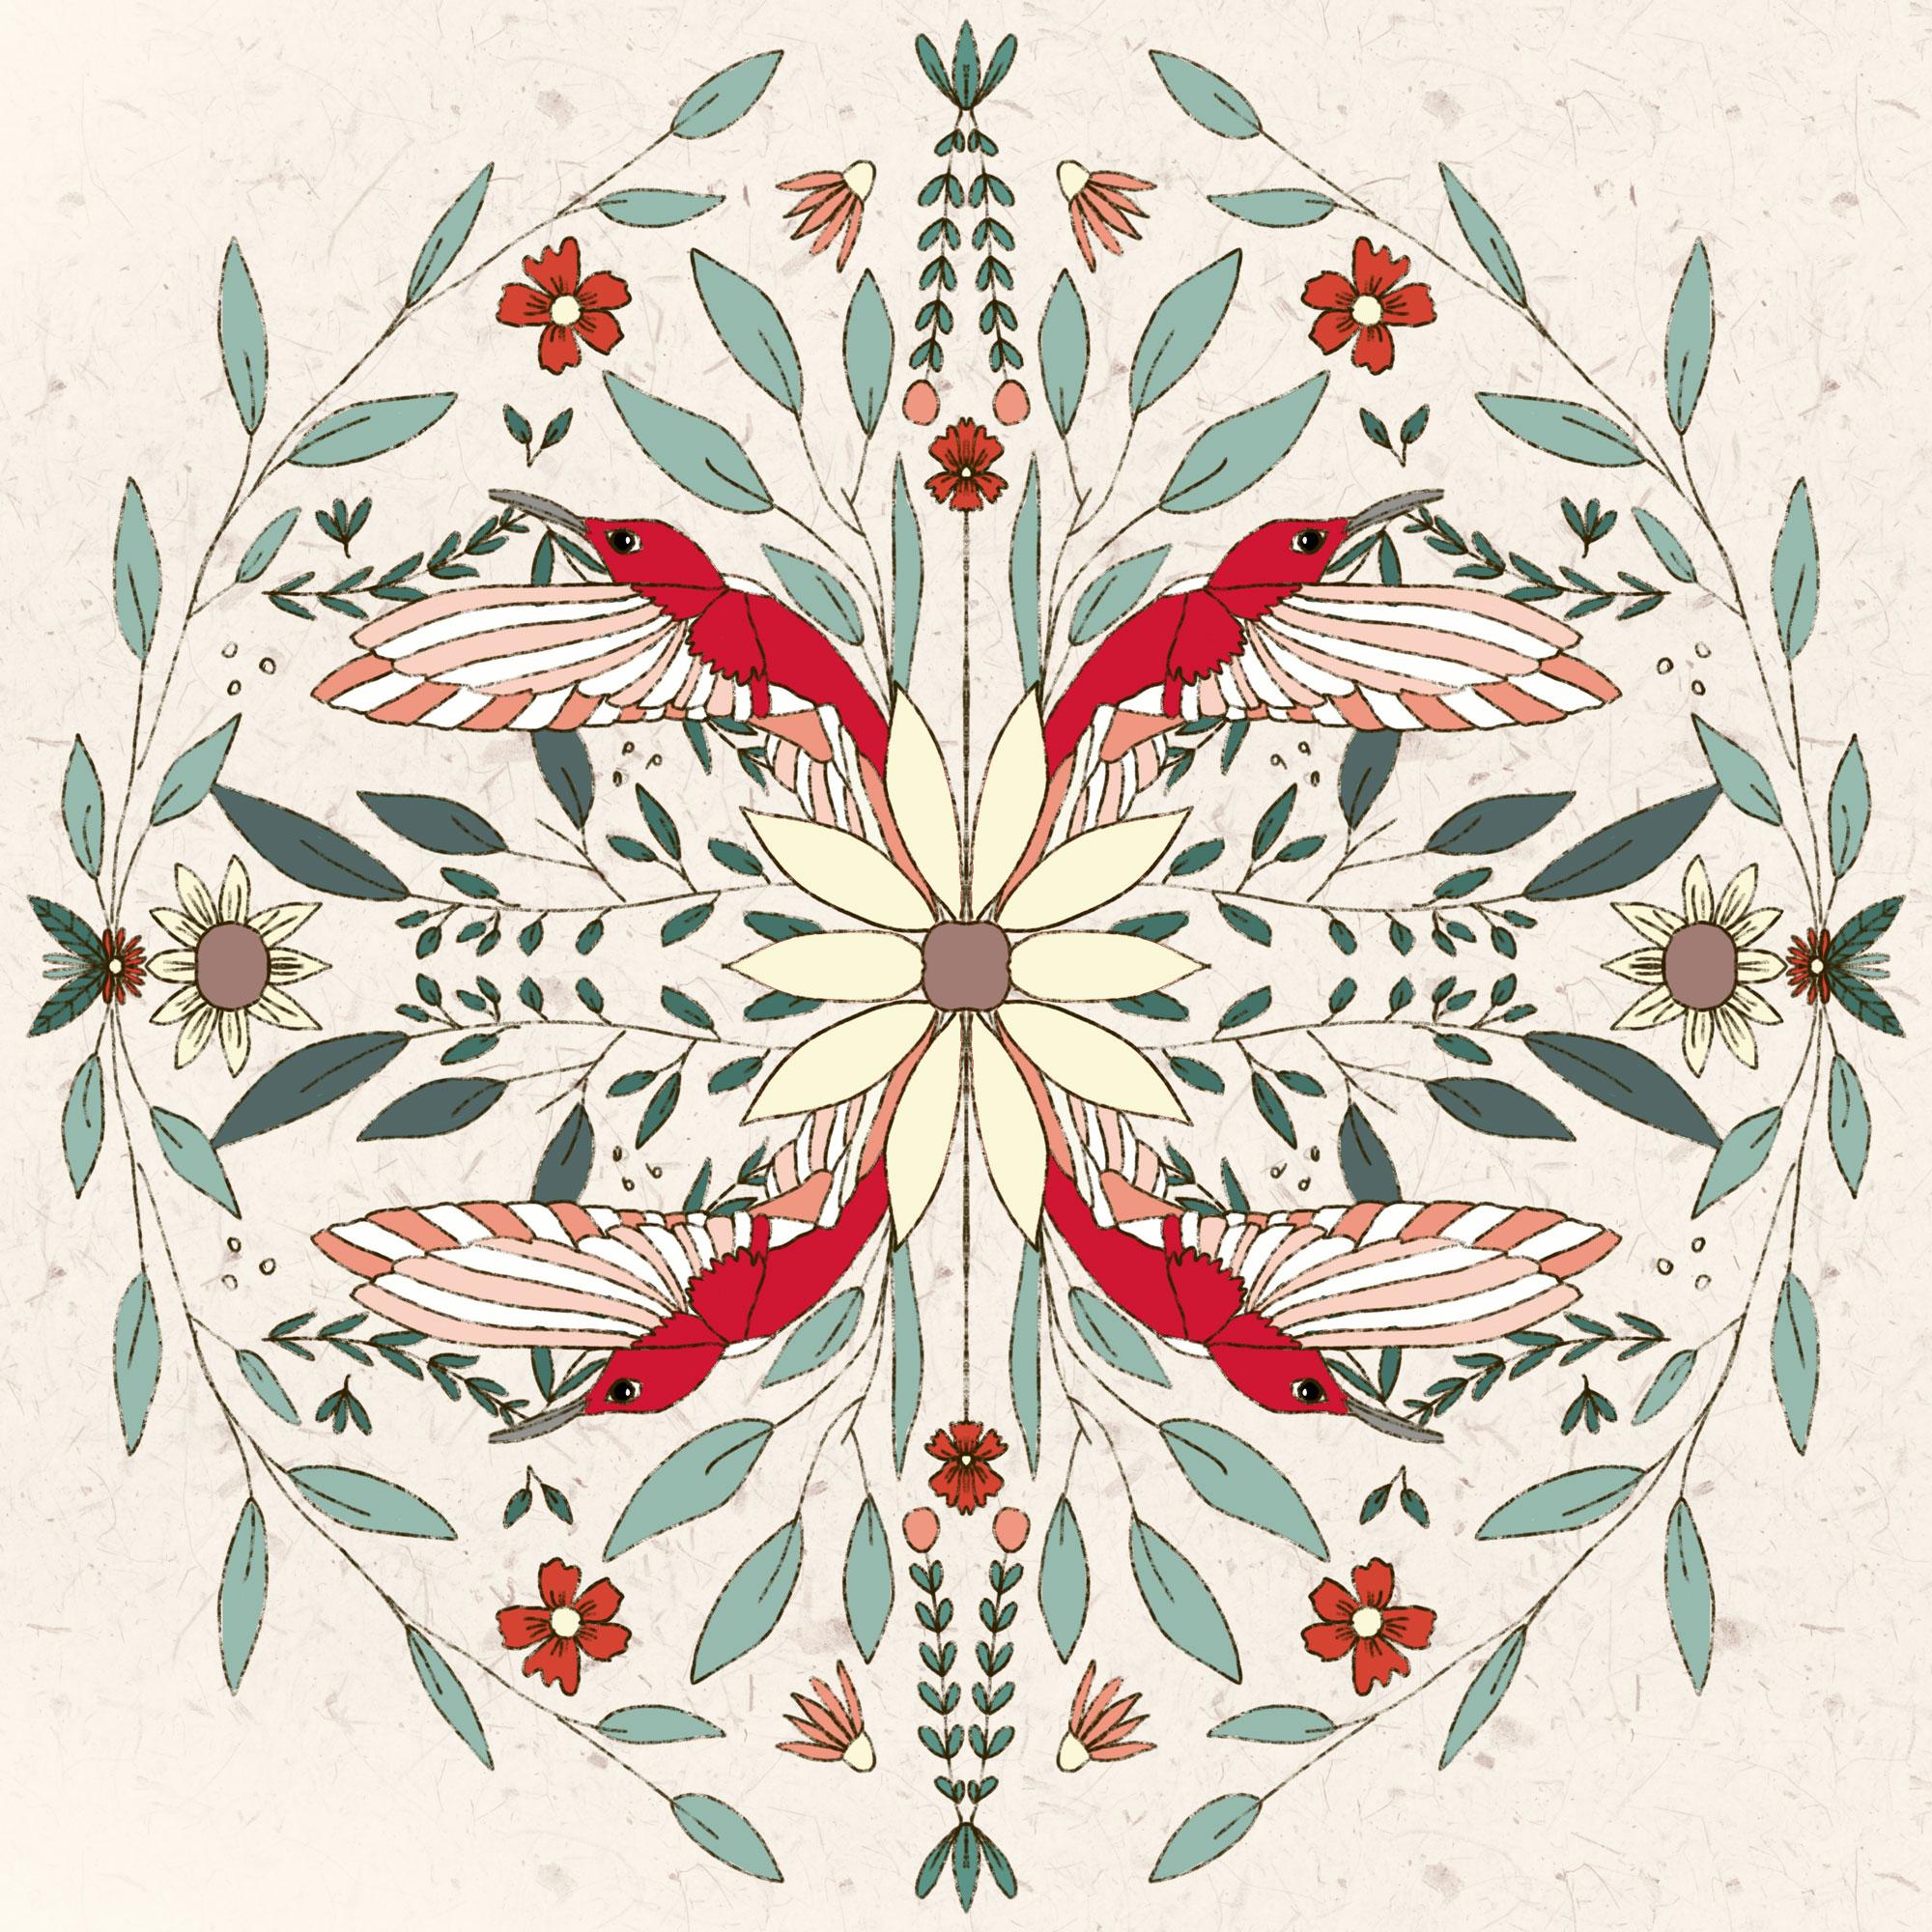 Hummingbirds-flat.jpg